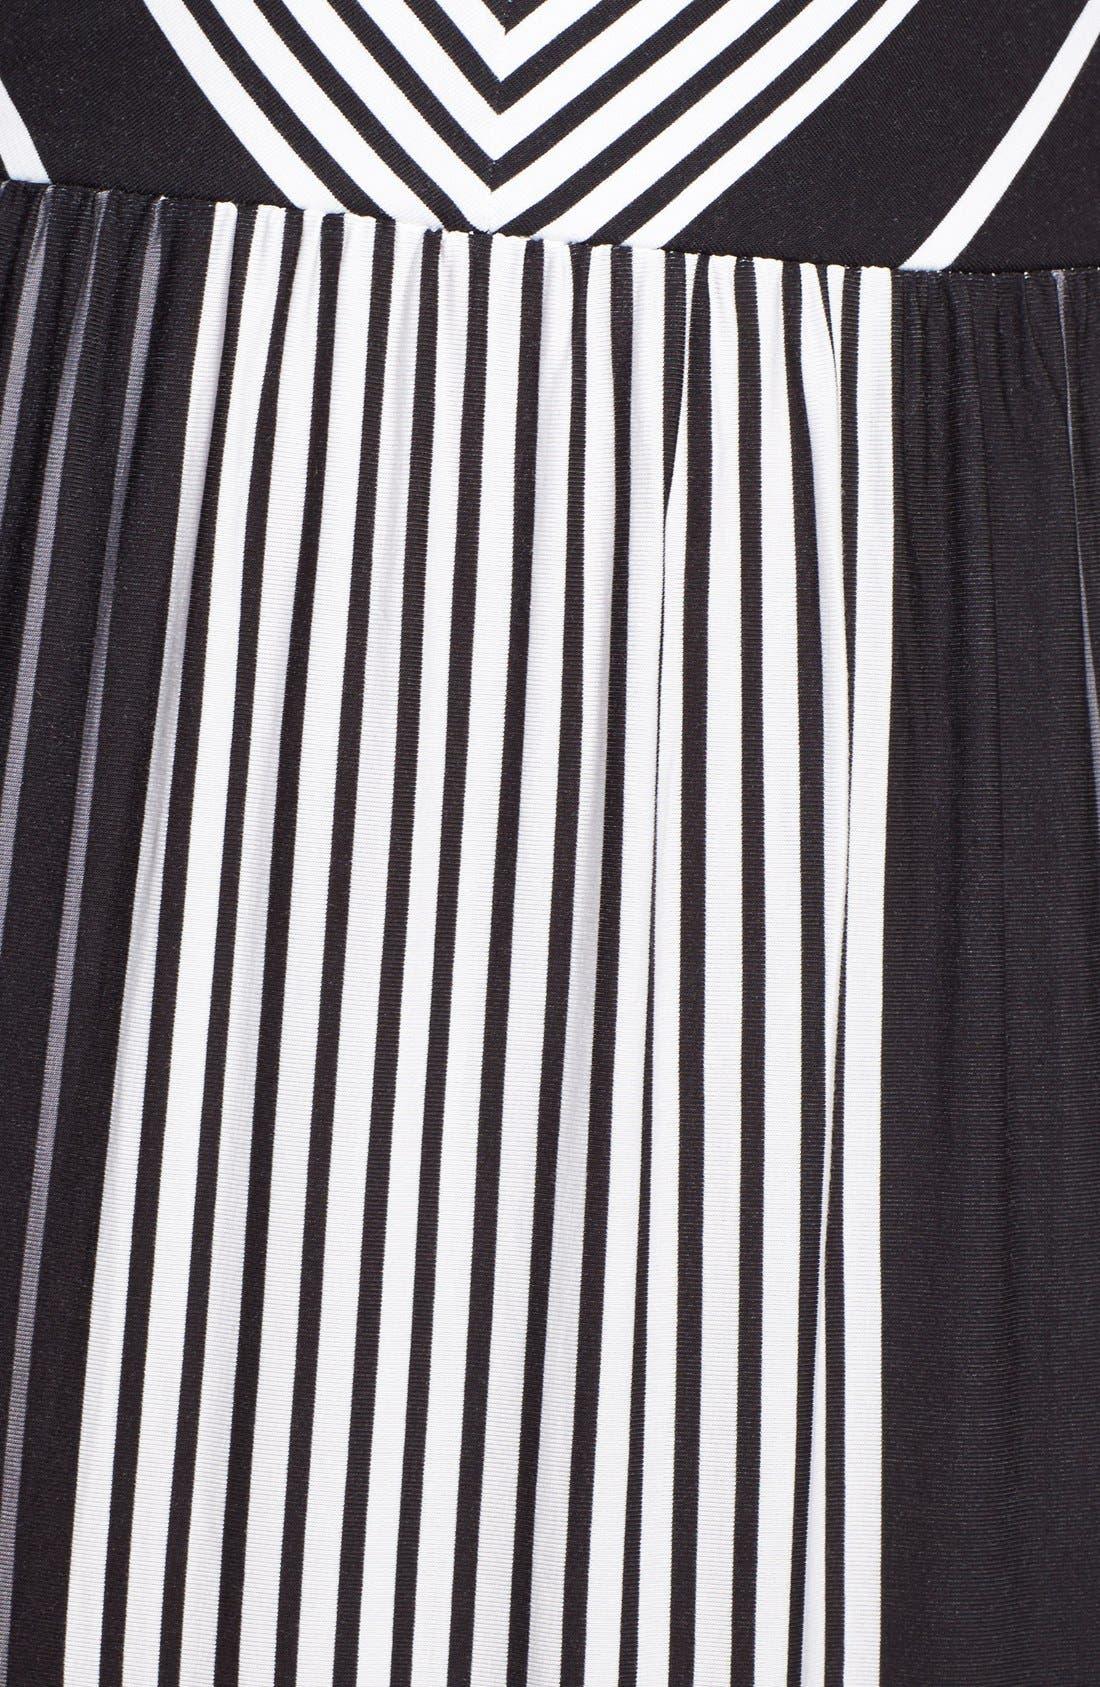 Alternate Image 3  - Felicity & Coco Stripe V-Neck Maxi Dress (Regular & Petite) (Nordstrom Exclusive)